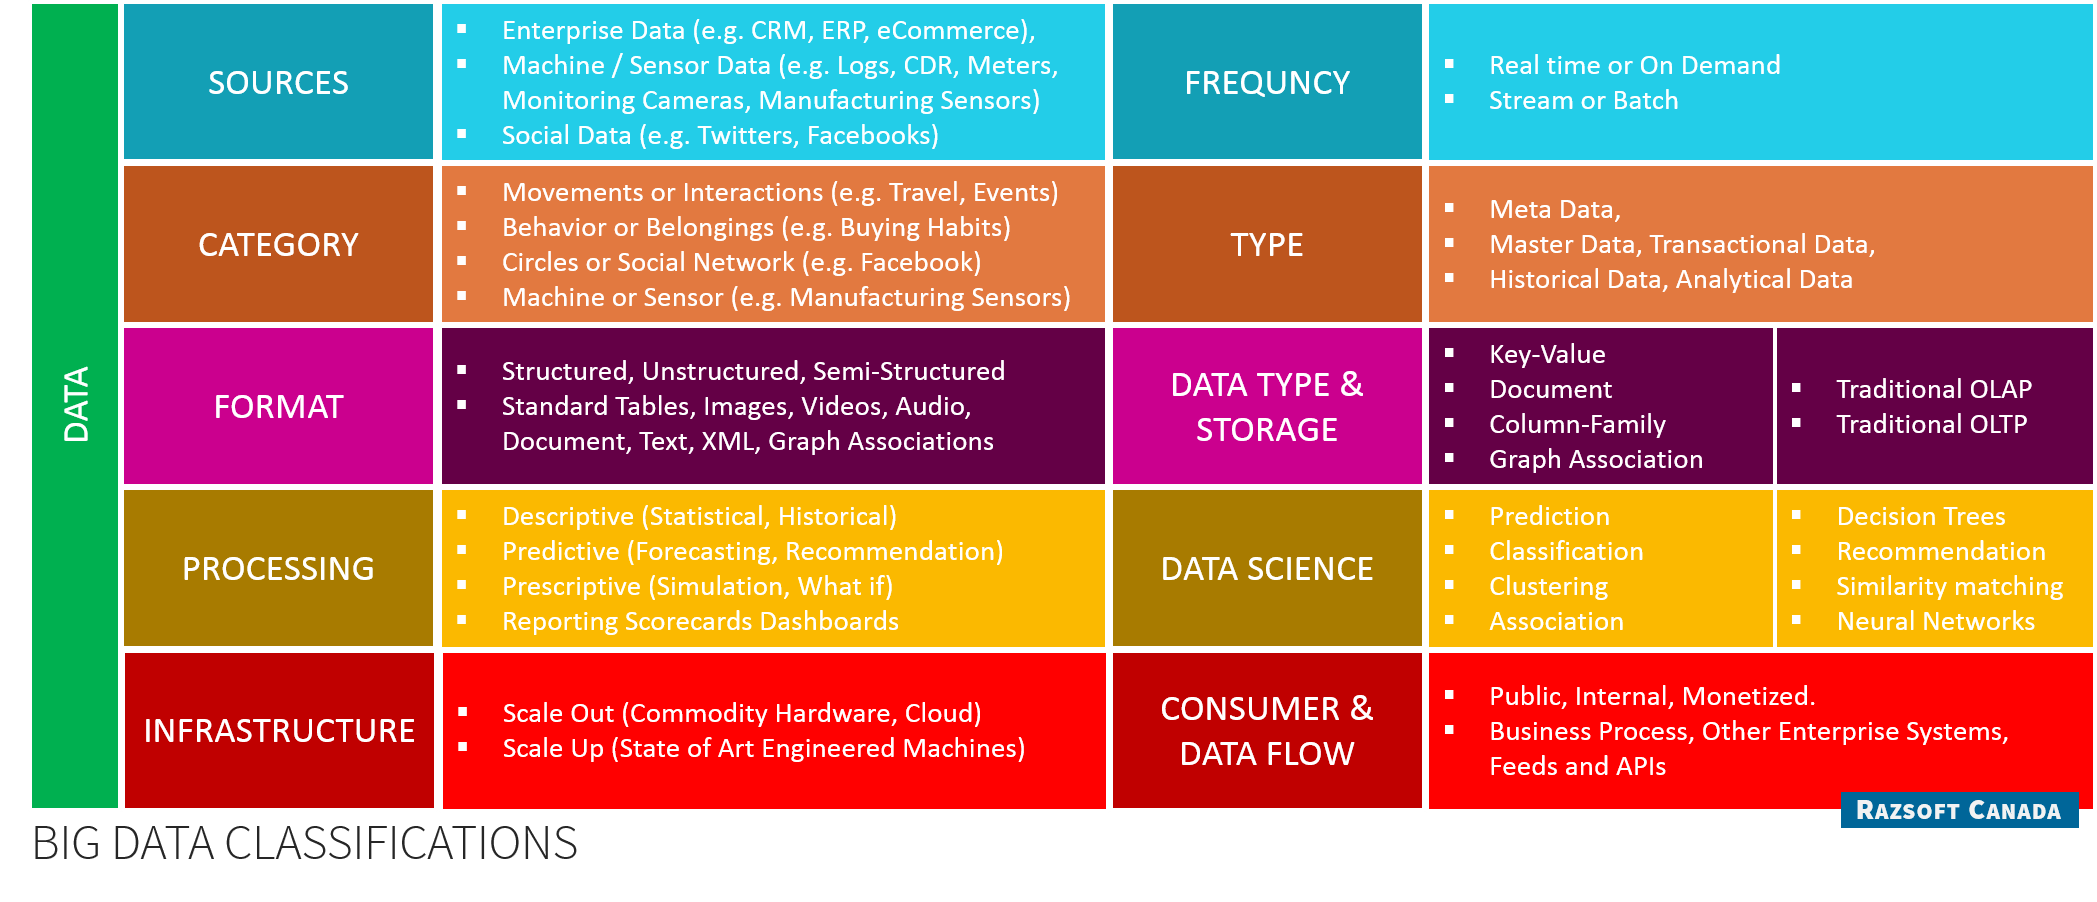 Razsoft Canada Big Data Service